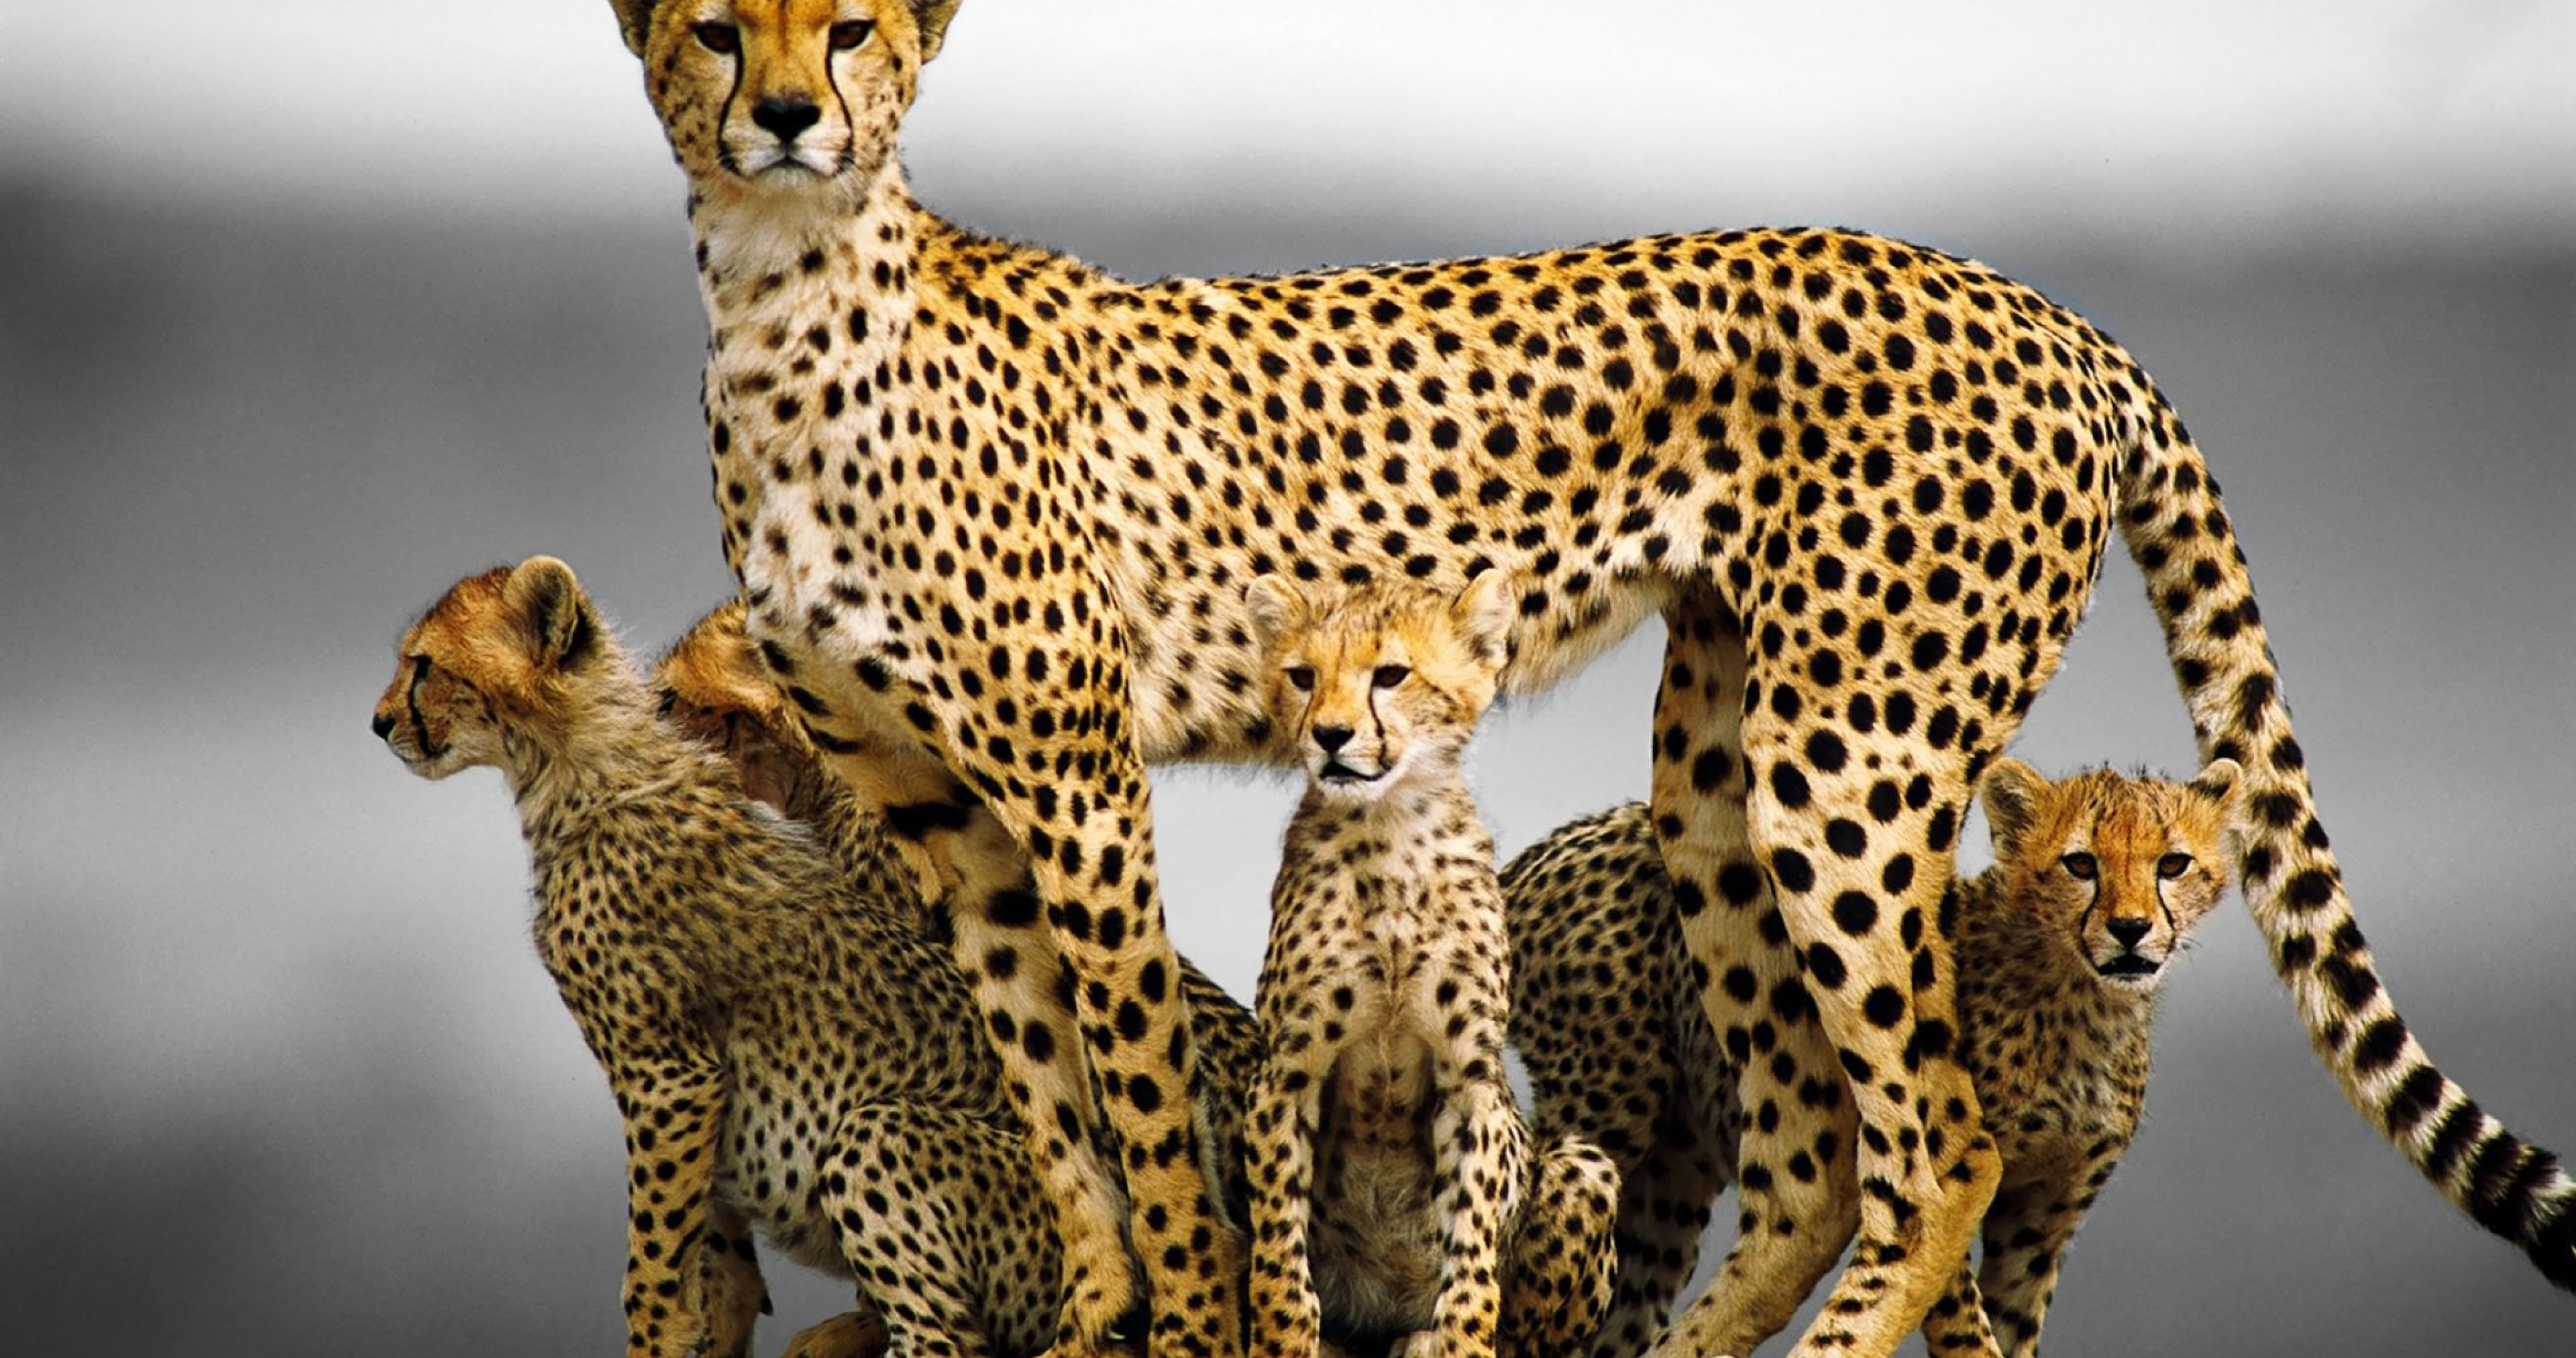 cheetah family 4k ultra hd wallpaper » High quality walls